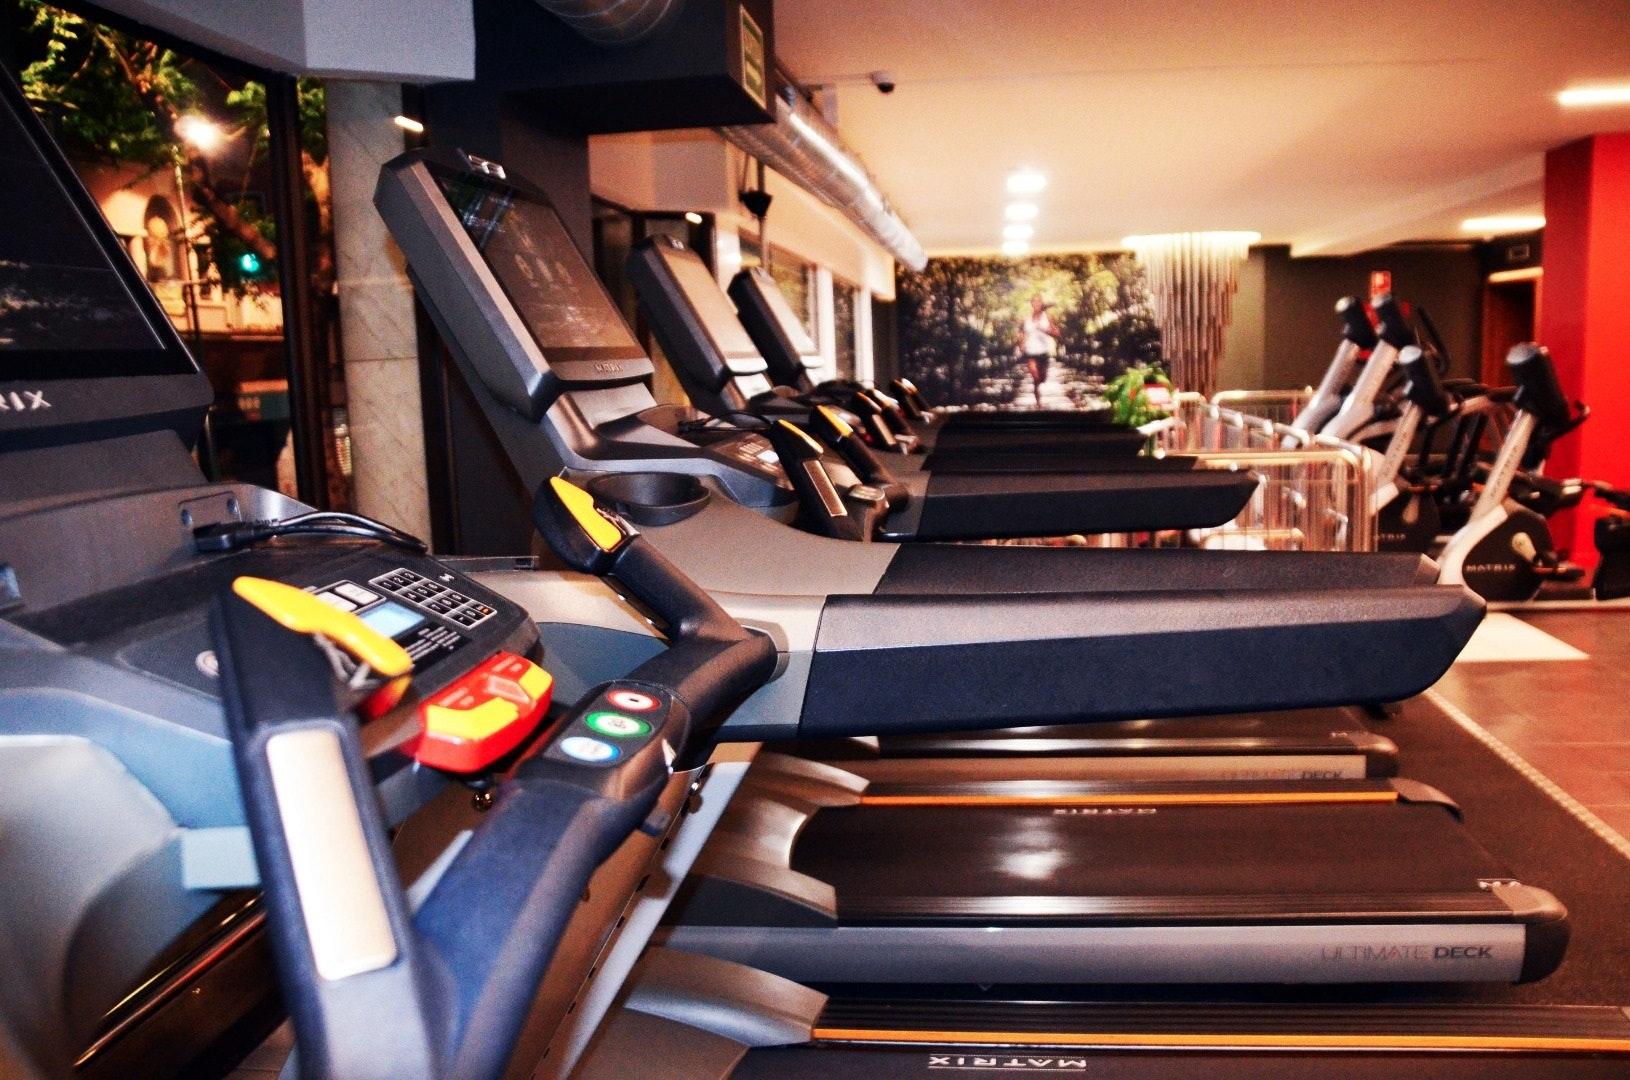 Foto 1 Oferta SNAP Fitness · 24-7 BCN- LESSEPS Barcelona {2} - GymForLess